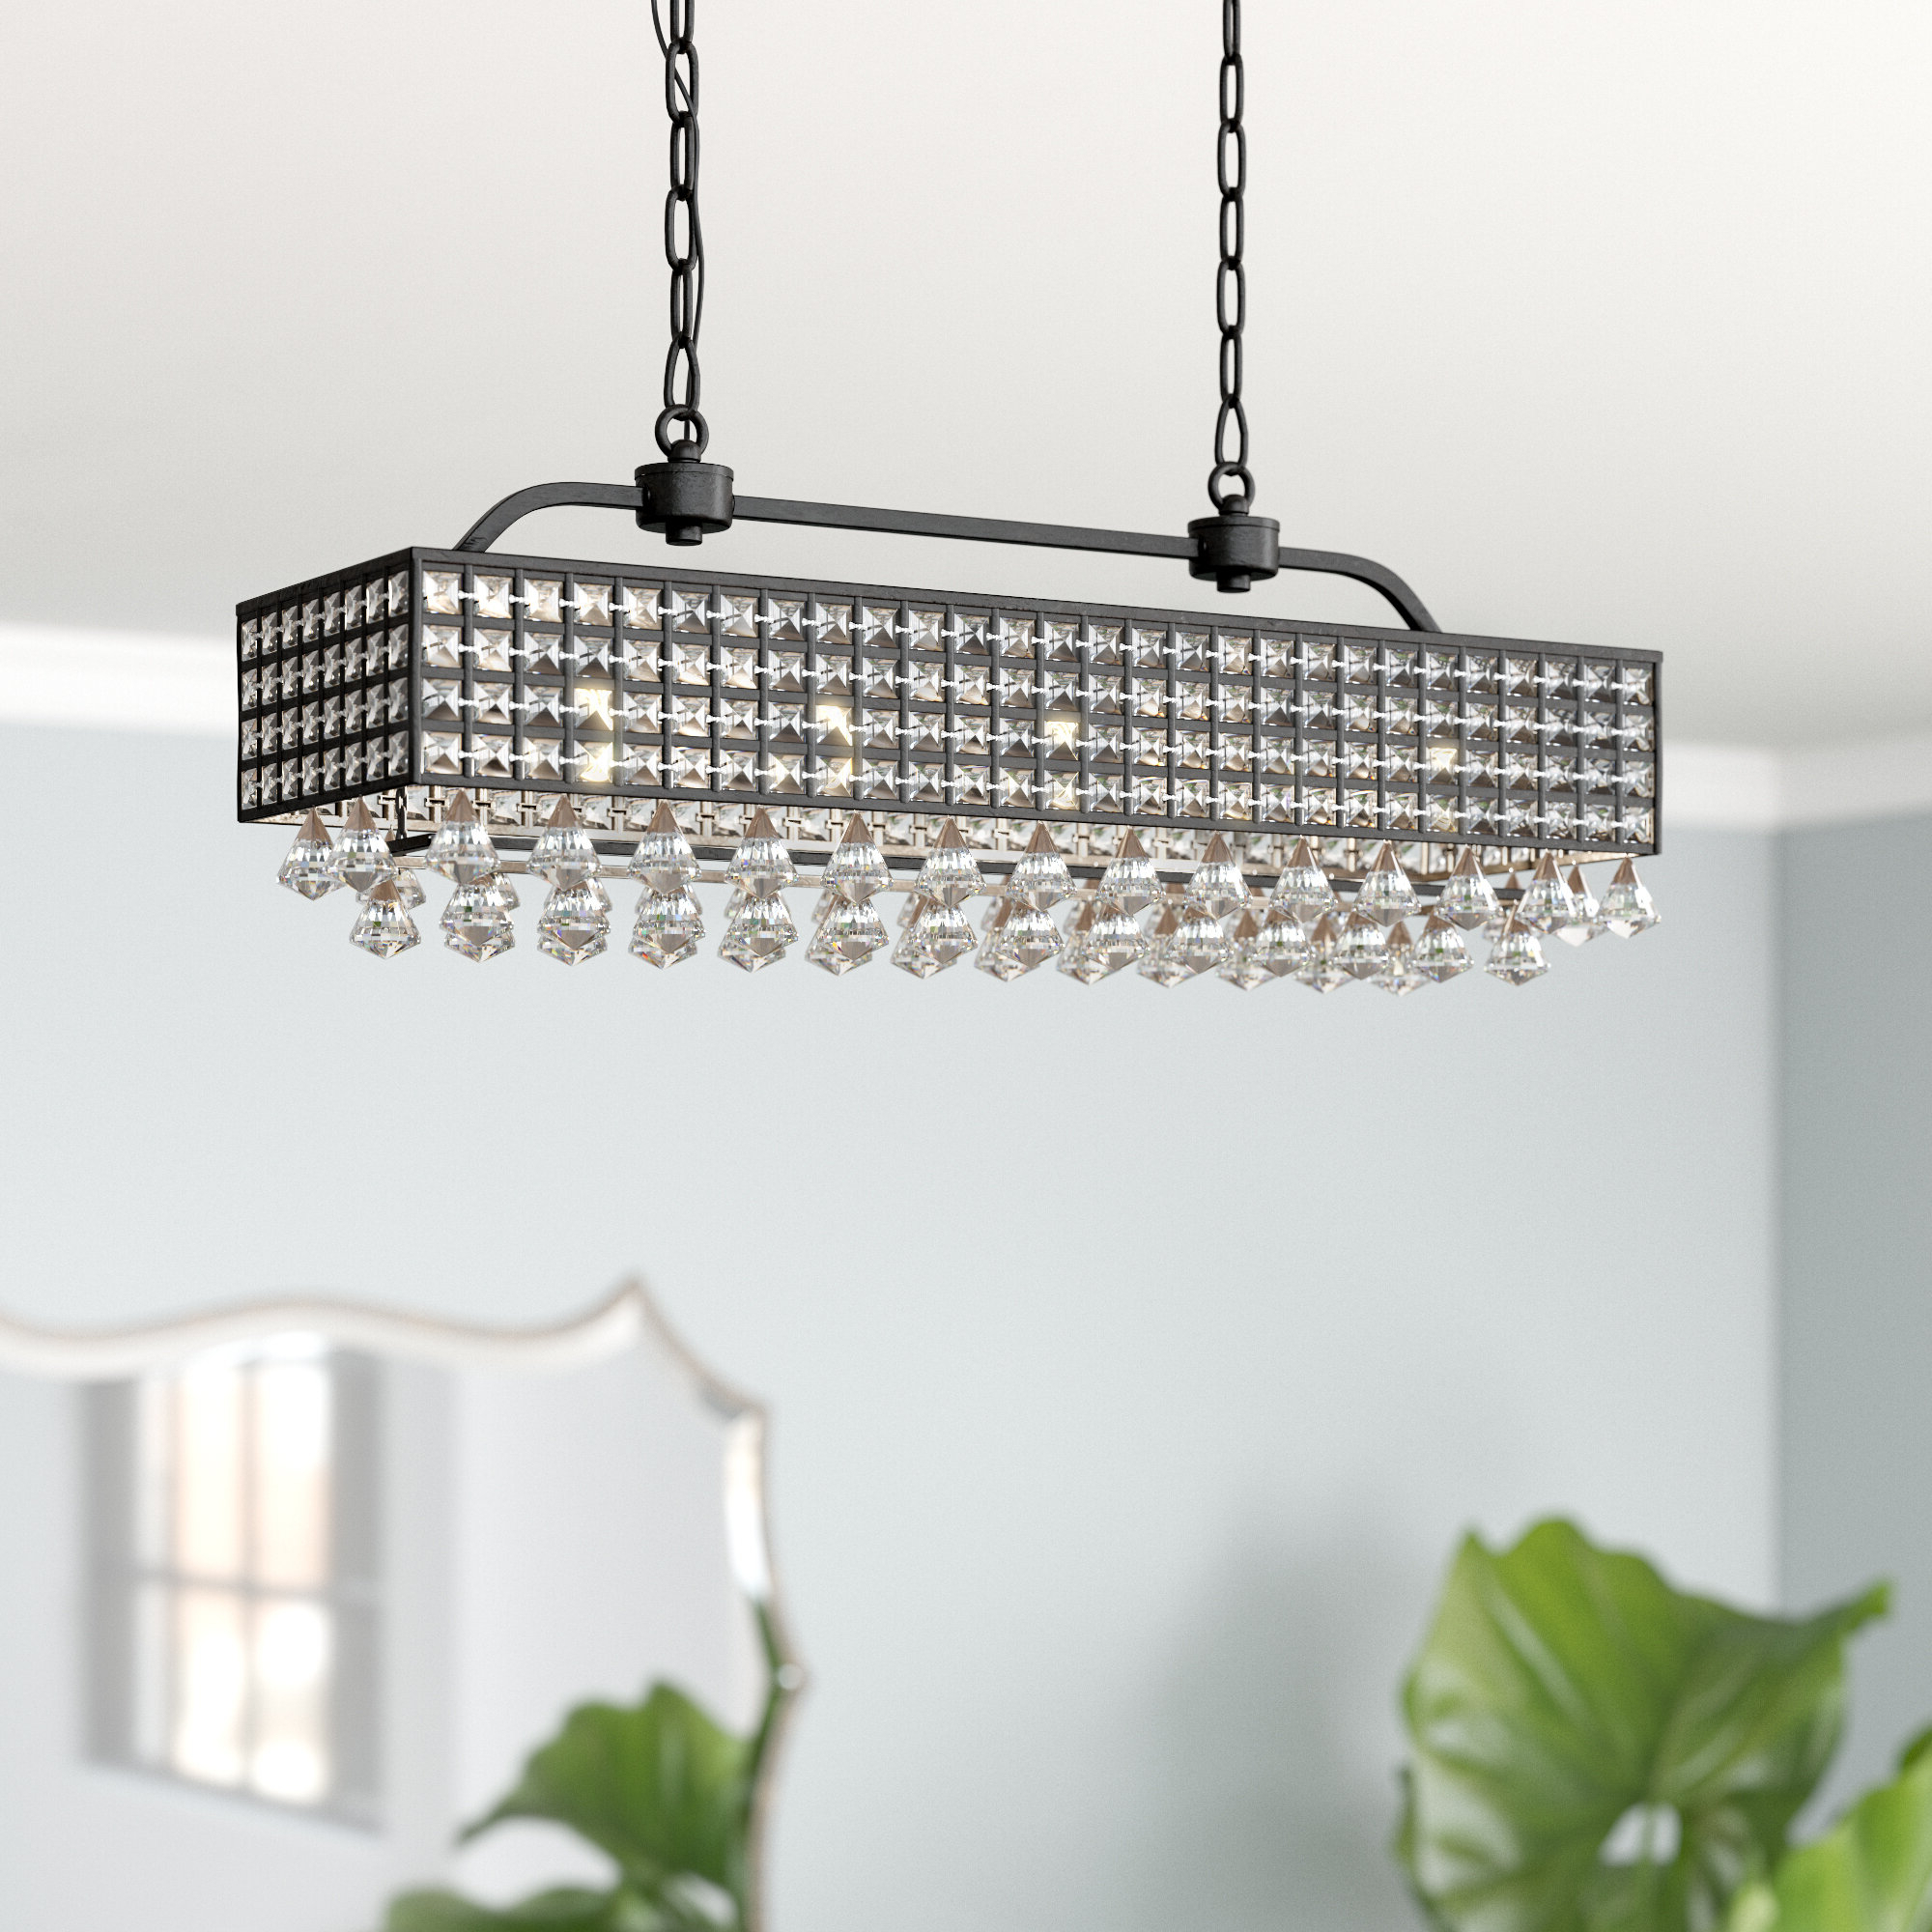 Fashionable Madilynn 5 Light Crystal Chandelier Throughout Verdell 5 Light Crystal Chandeliers (View 12 of 25)